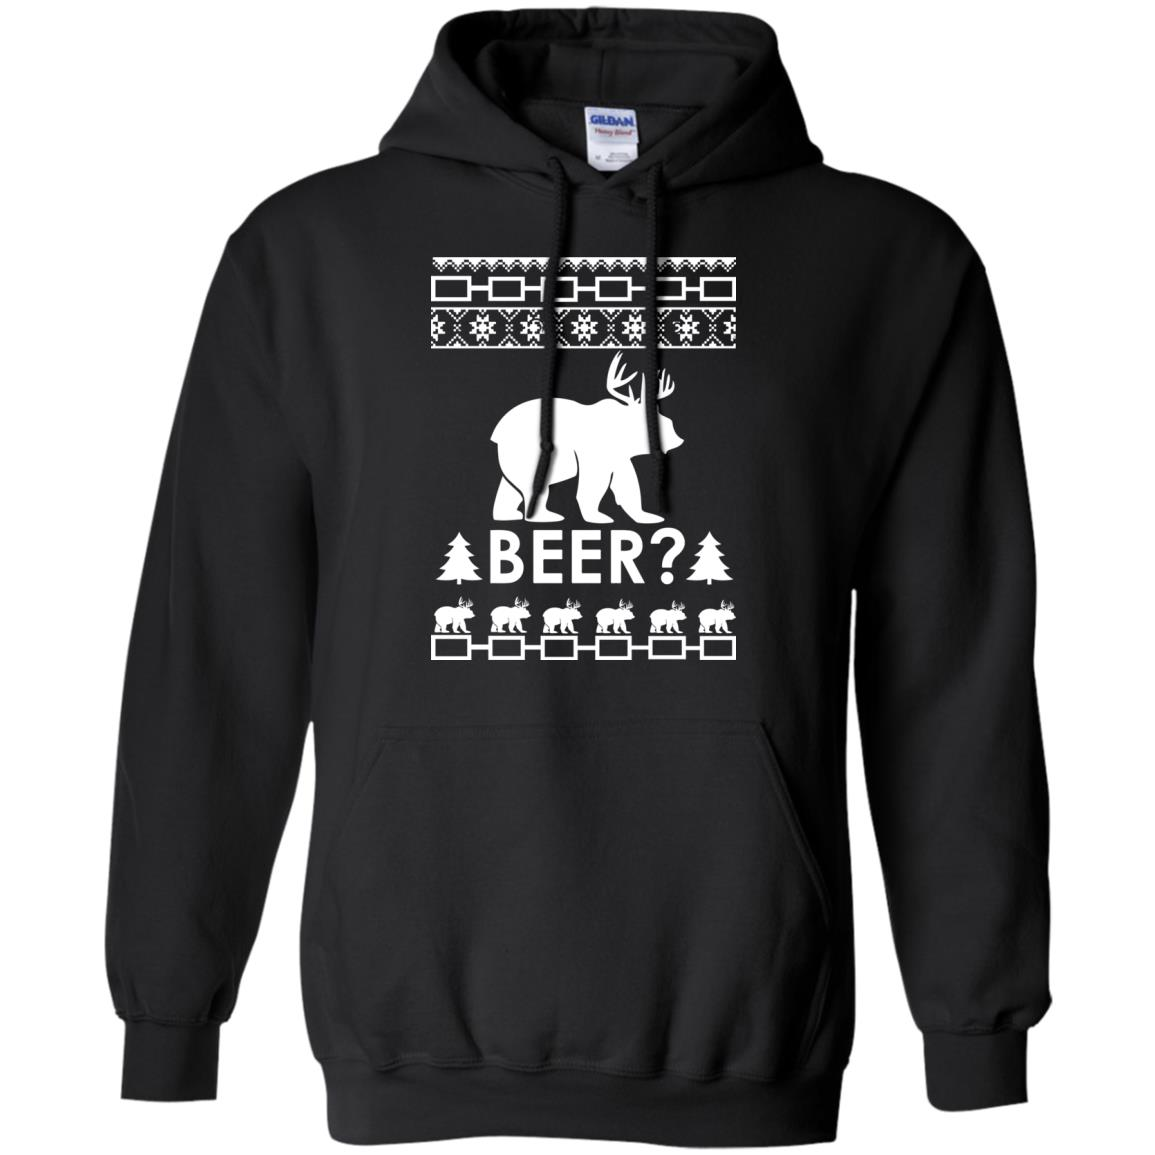 image 2362 - Christmas Beer Bear-Reindeer Ugly Sweater, Shirt